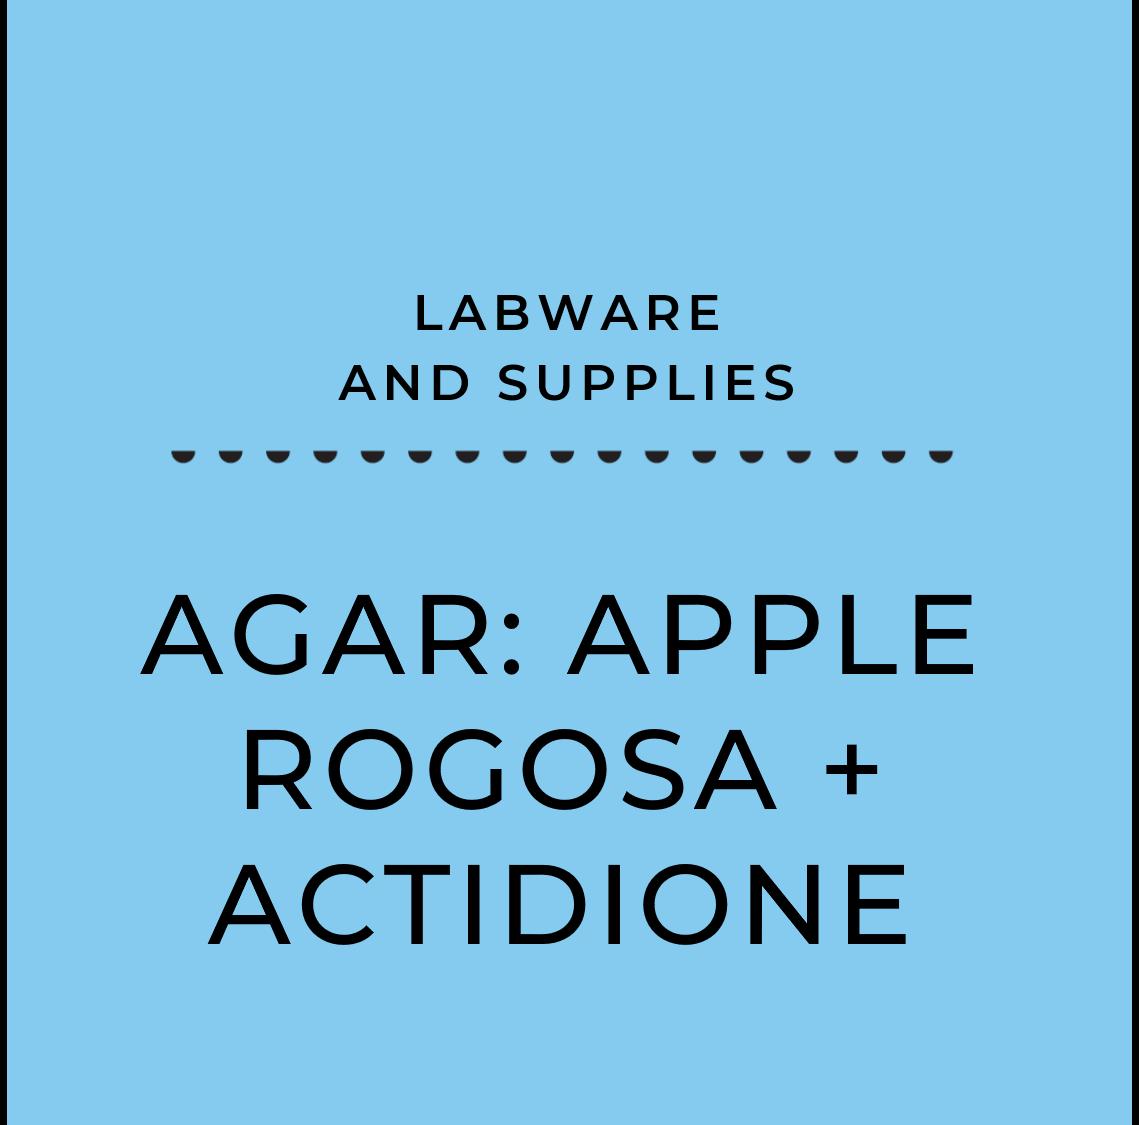 Agar: Apple Rogosa + actidione